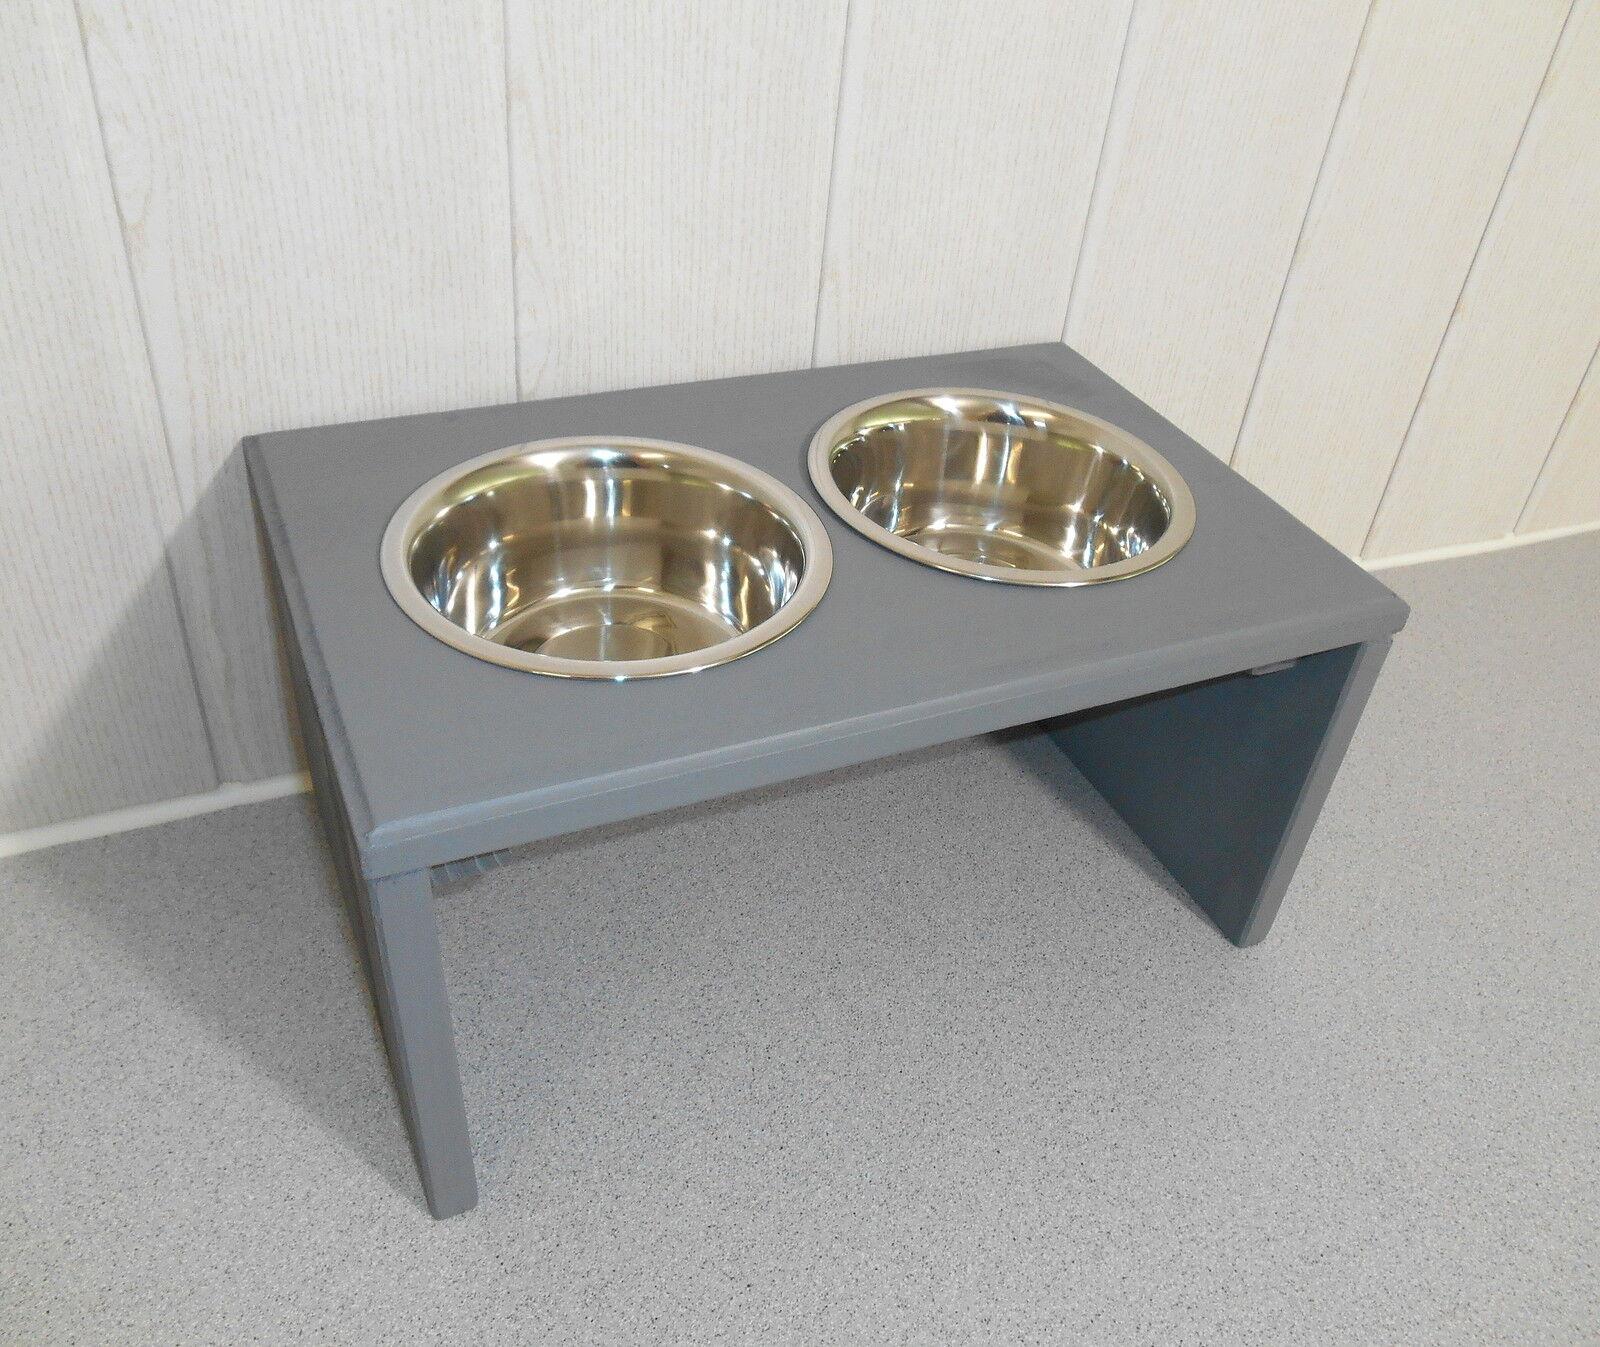 Hundenapf   Hundebar   Futternapf   Buche-Napf, grau, Jede Farbe möglich (920)